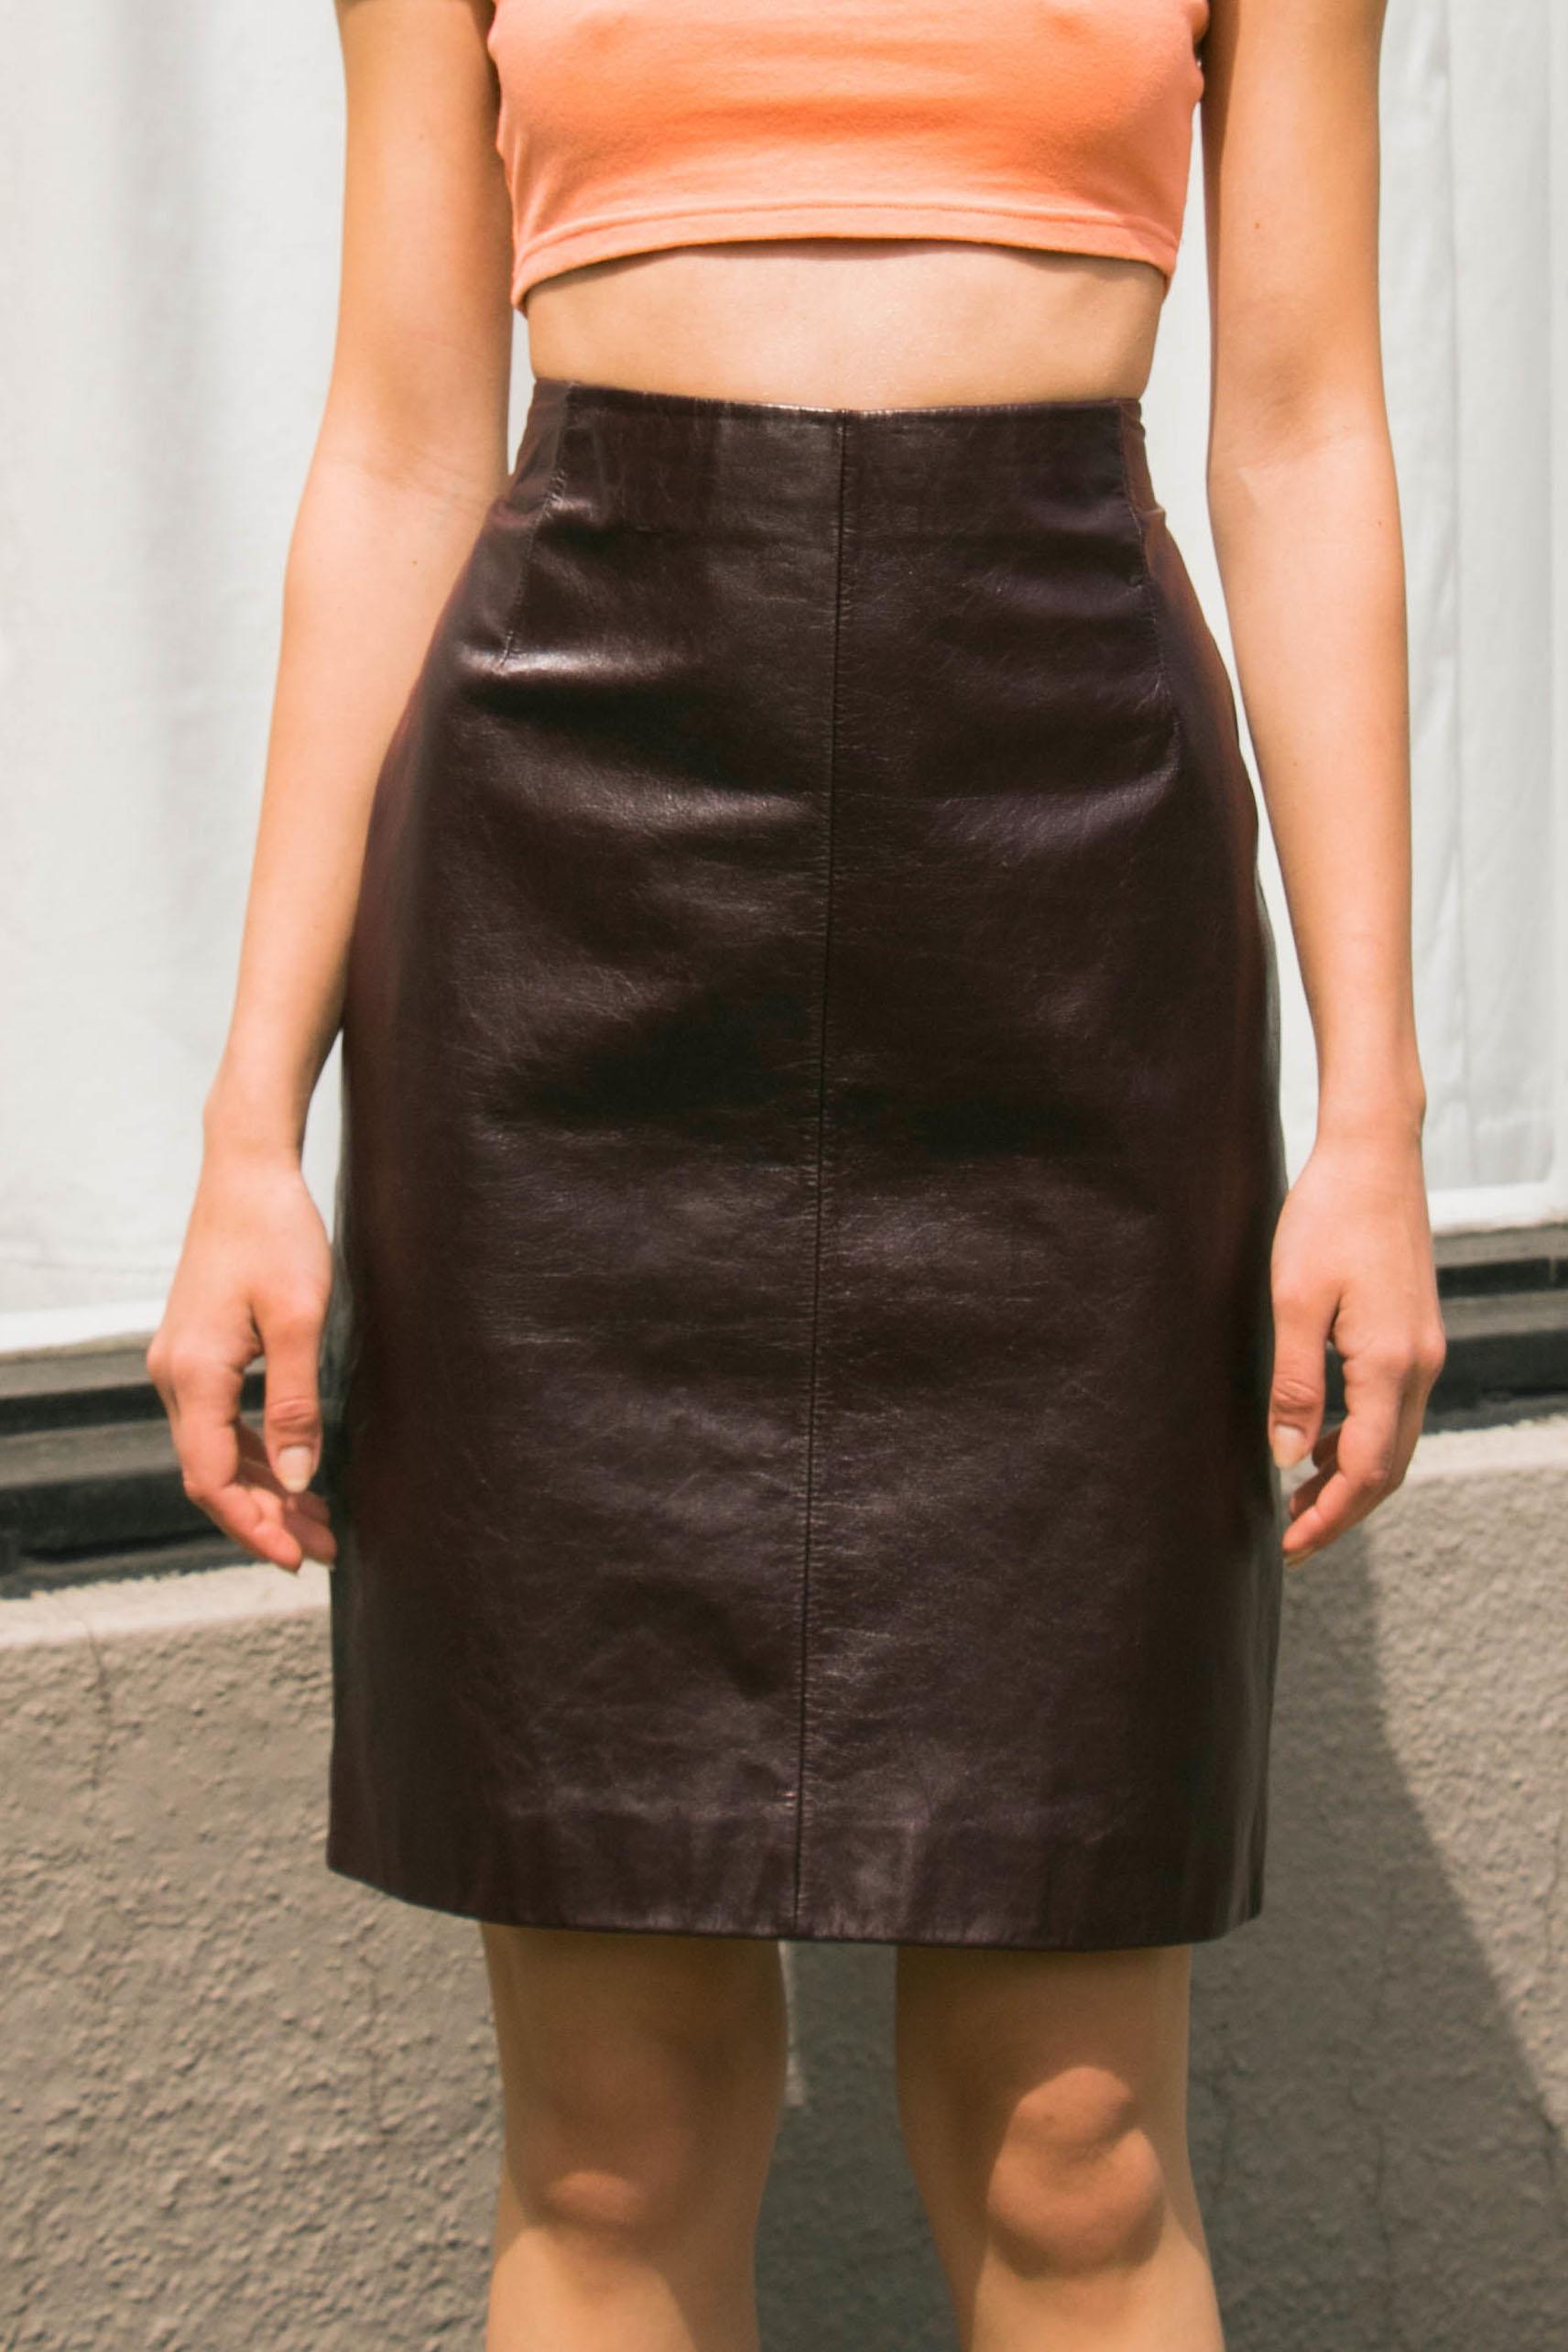 Vintage Wine Leather Paneled Skirt (S) — I Am That